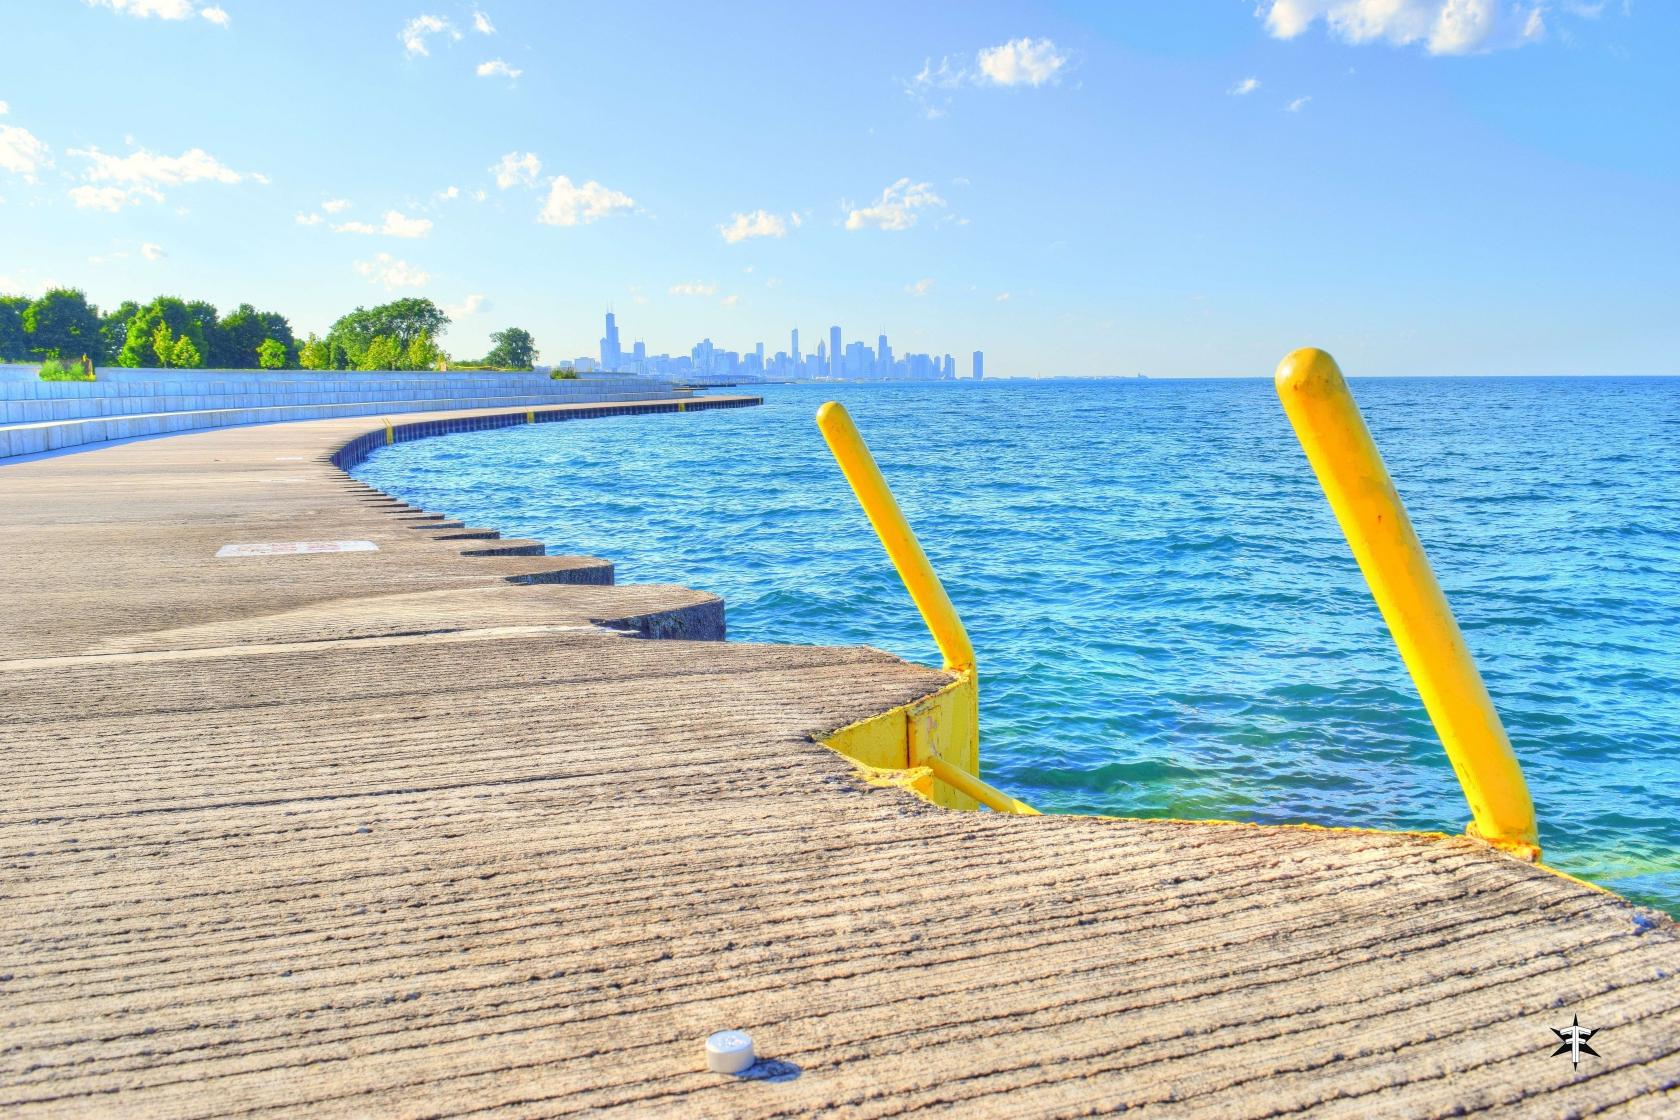 batch_chicago lake michigan skyline water colorful summer ladder swimming.jpg